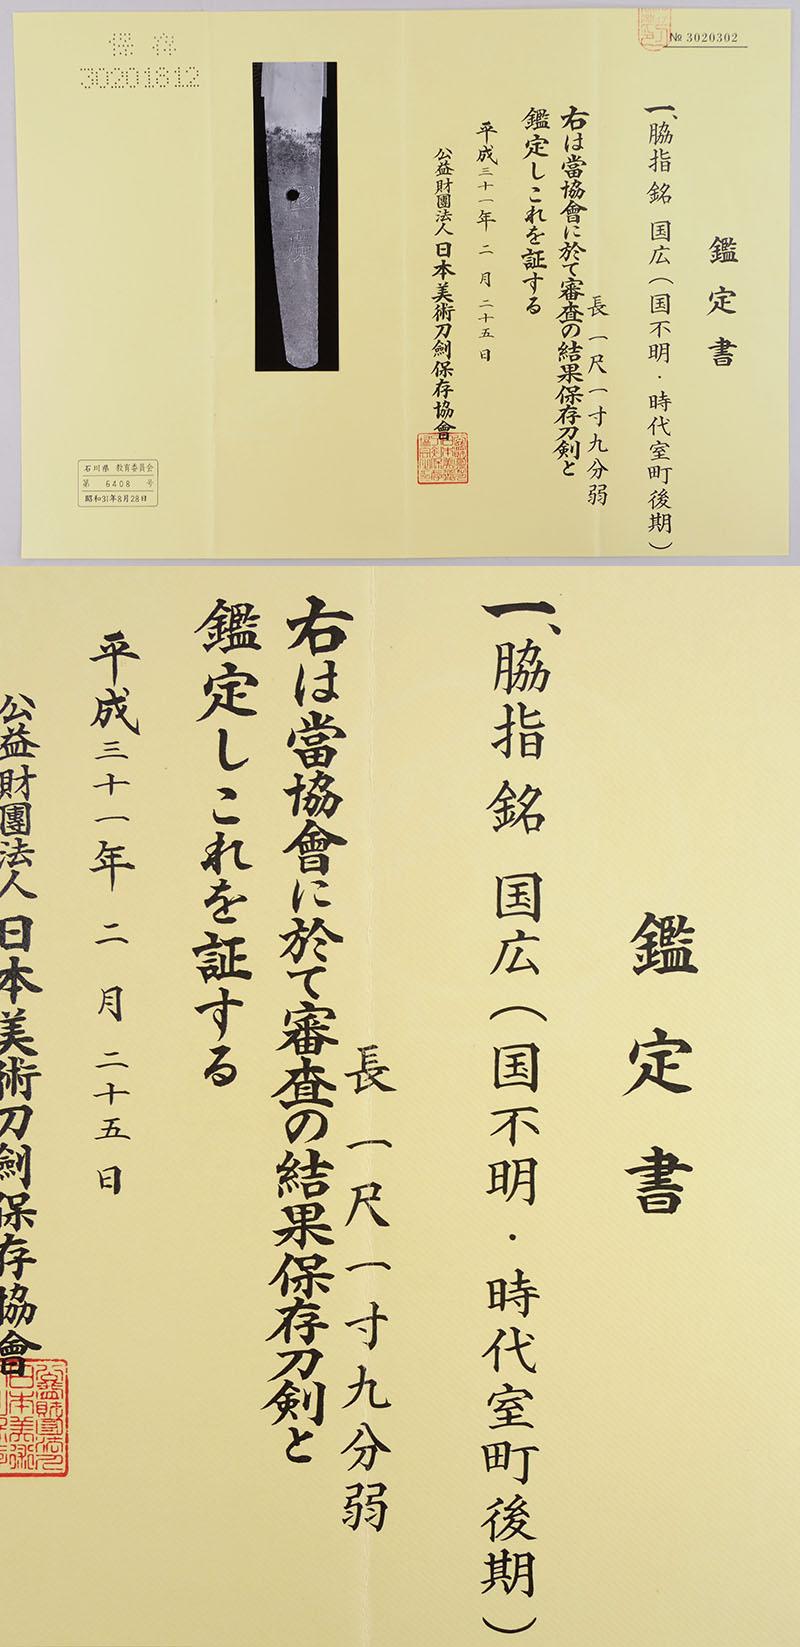 国広(国不明・時代室町後期) Picture of Certificate